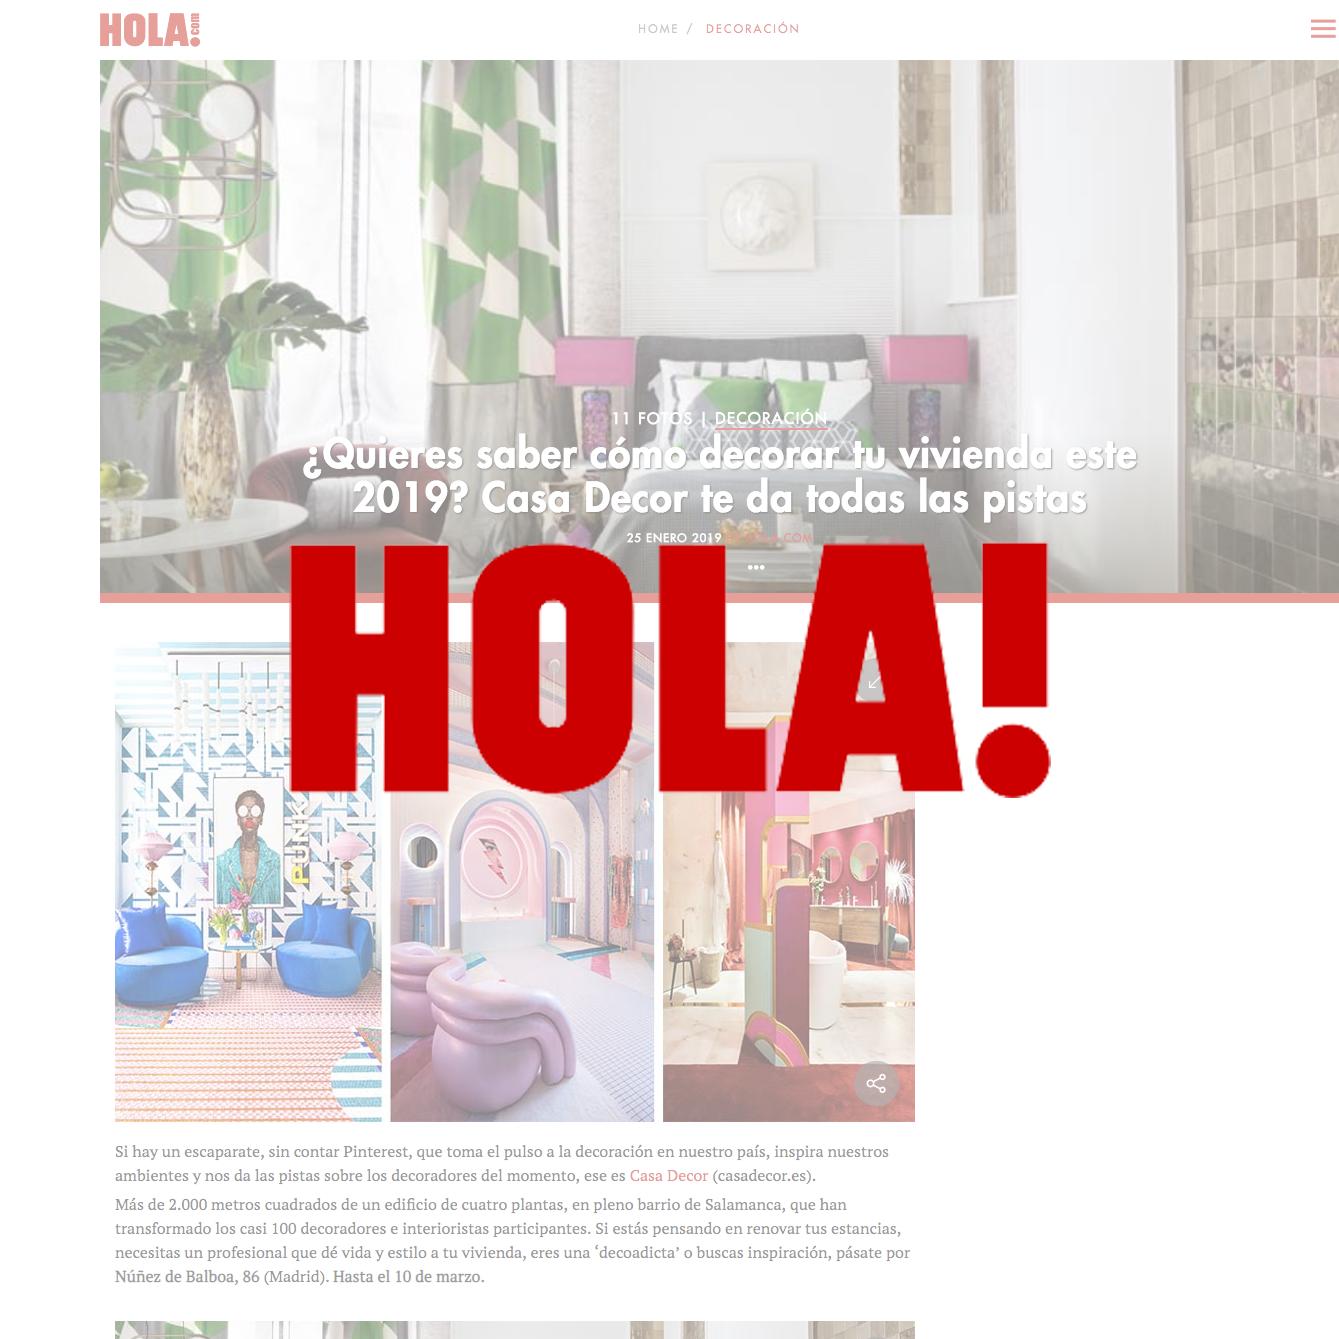 HOLA! - ENERO 2019